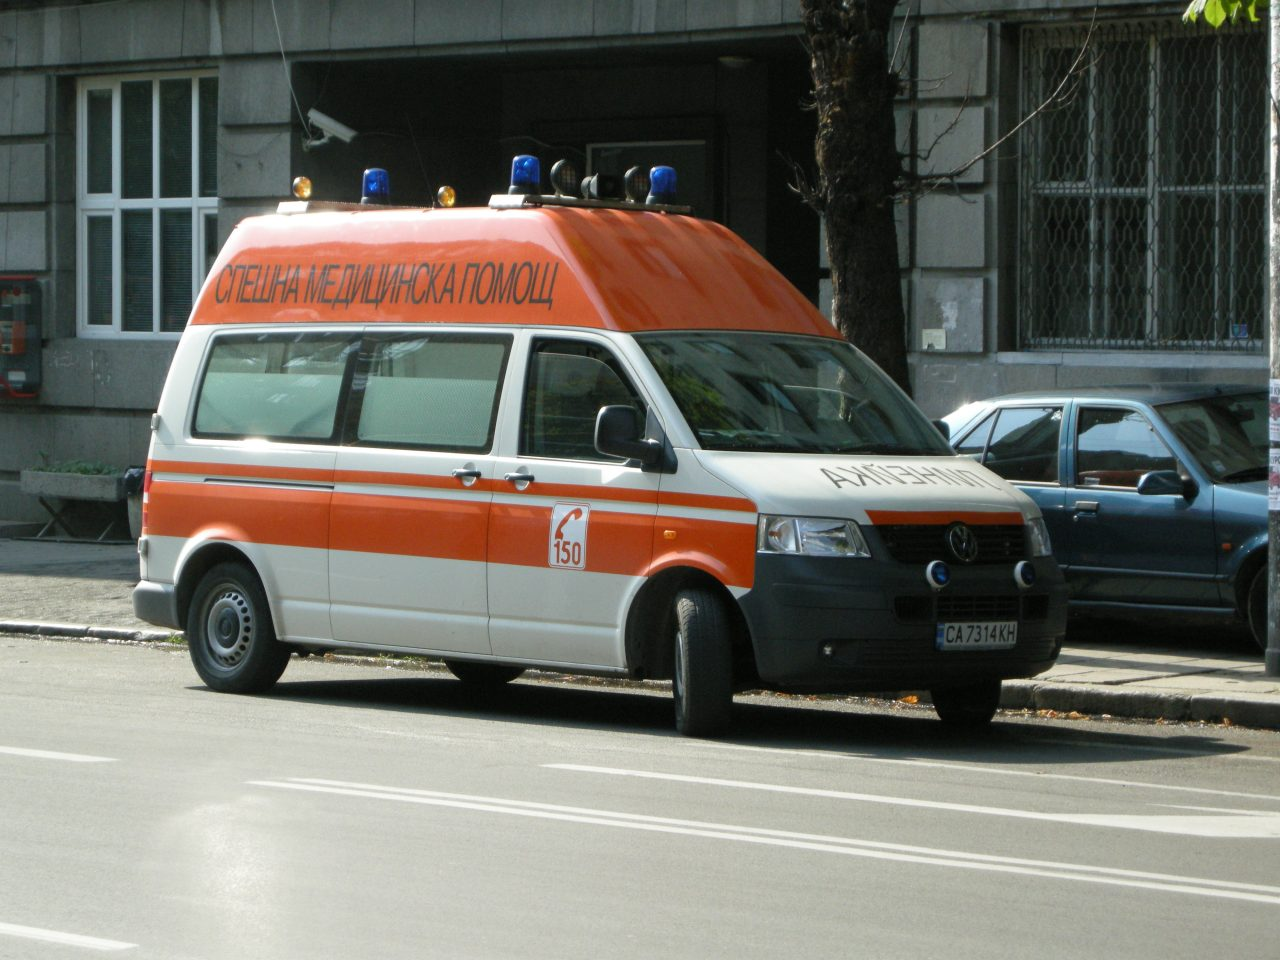 Ambulance_from_Bulgaria-1280x960.jpg